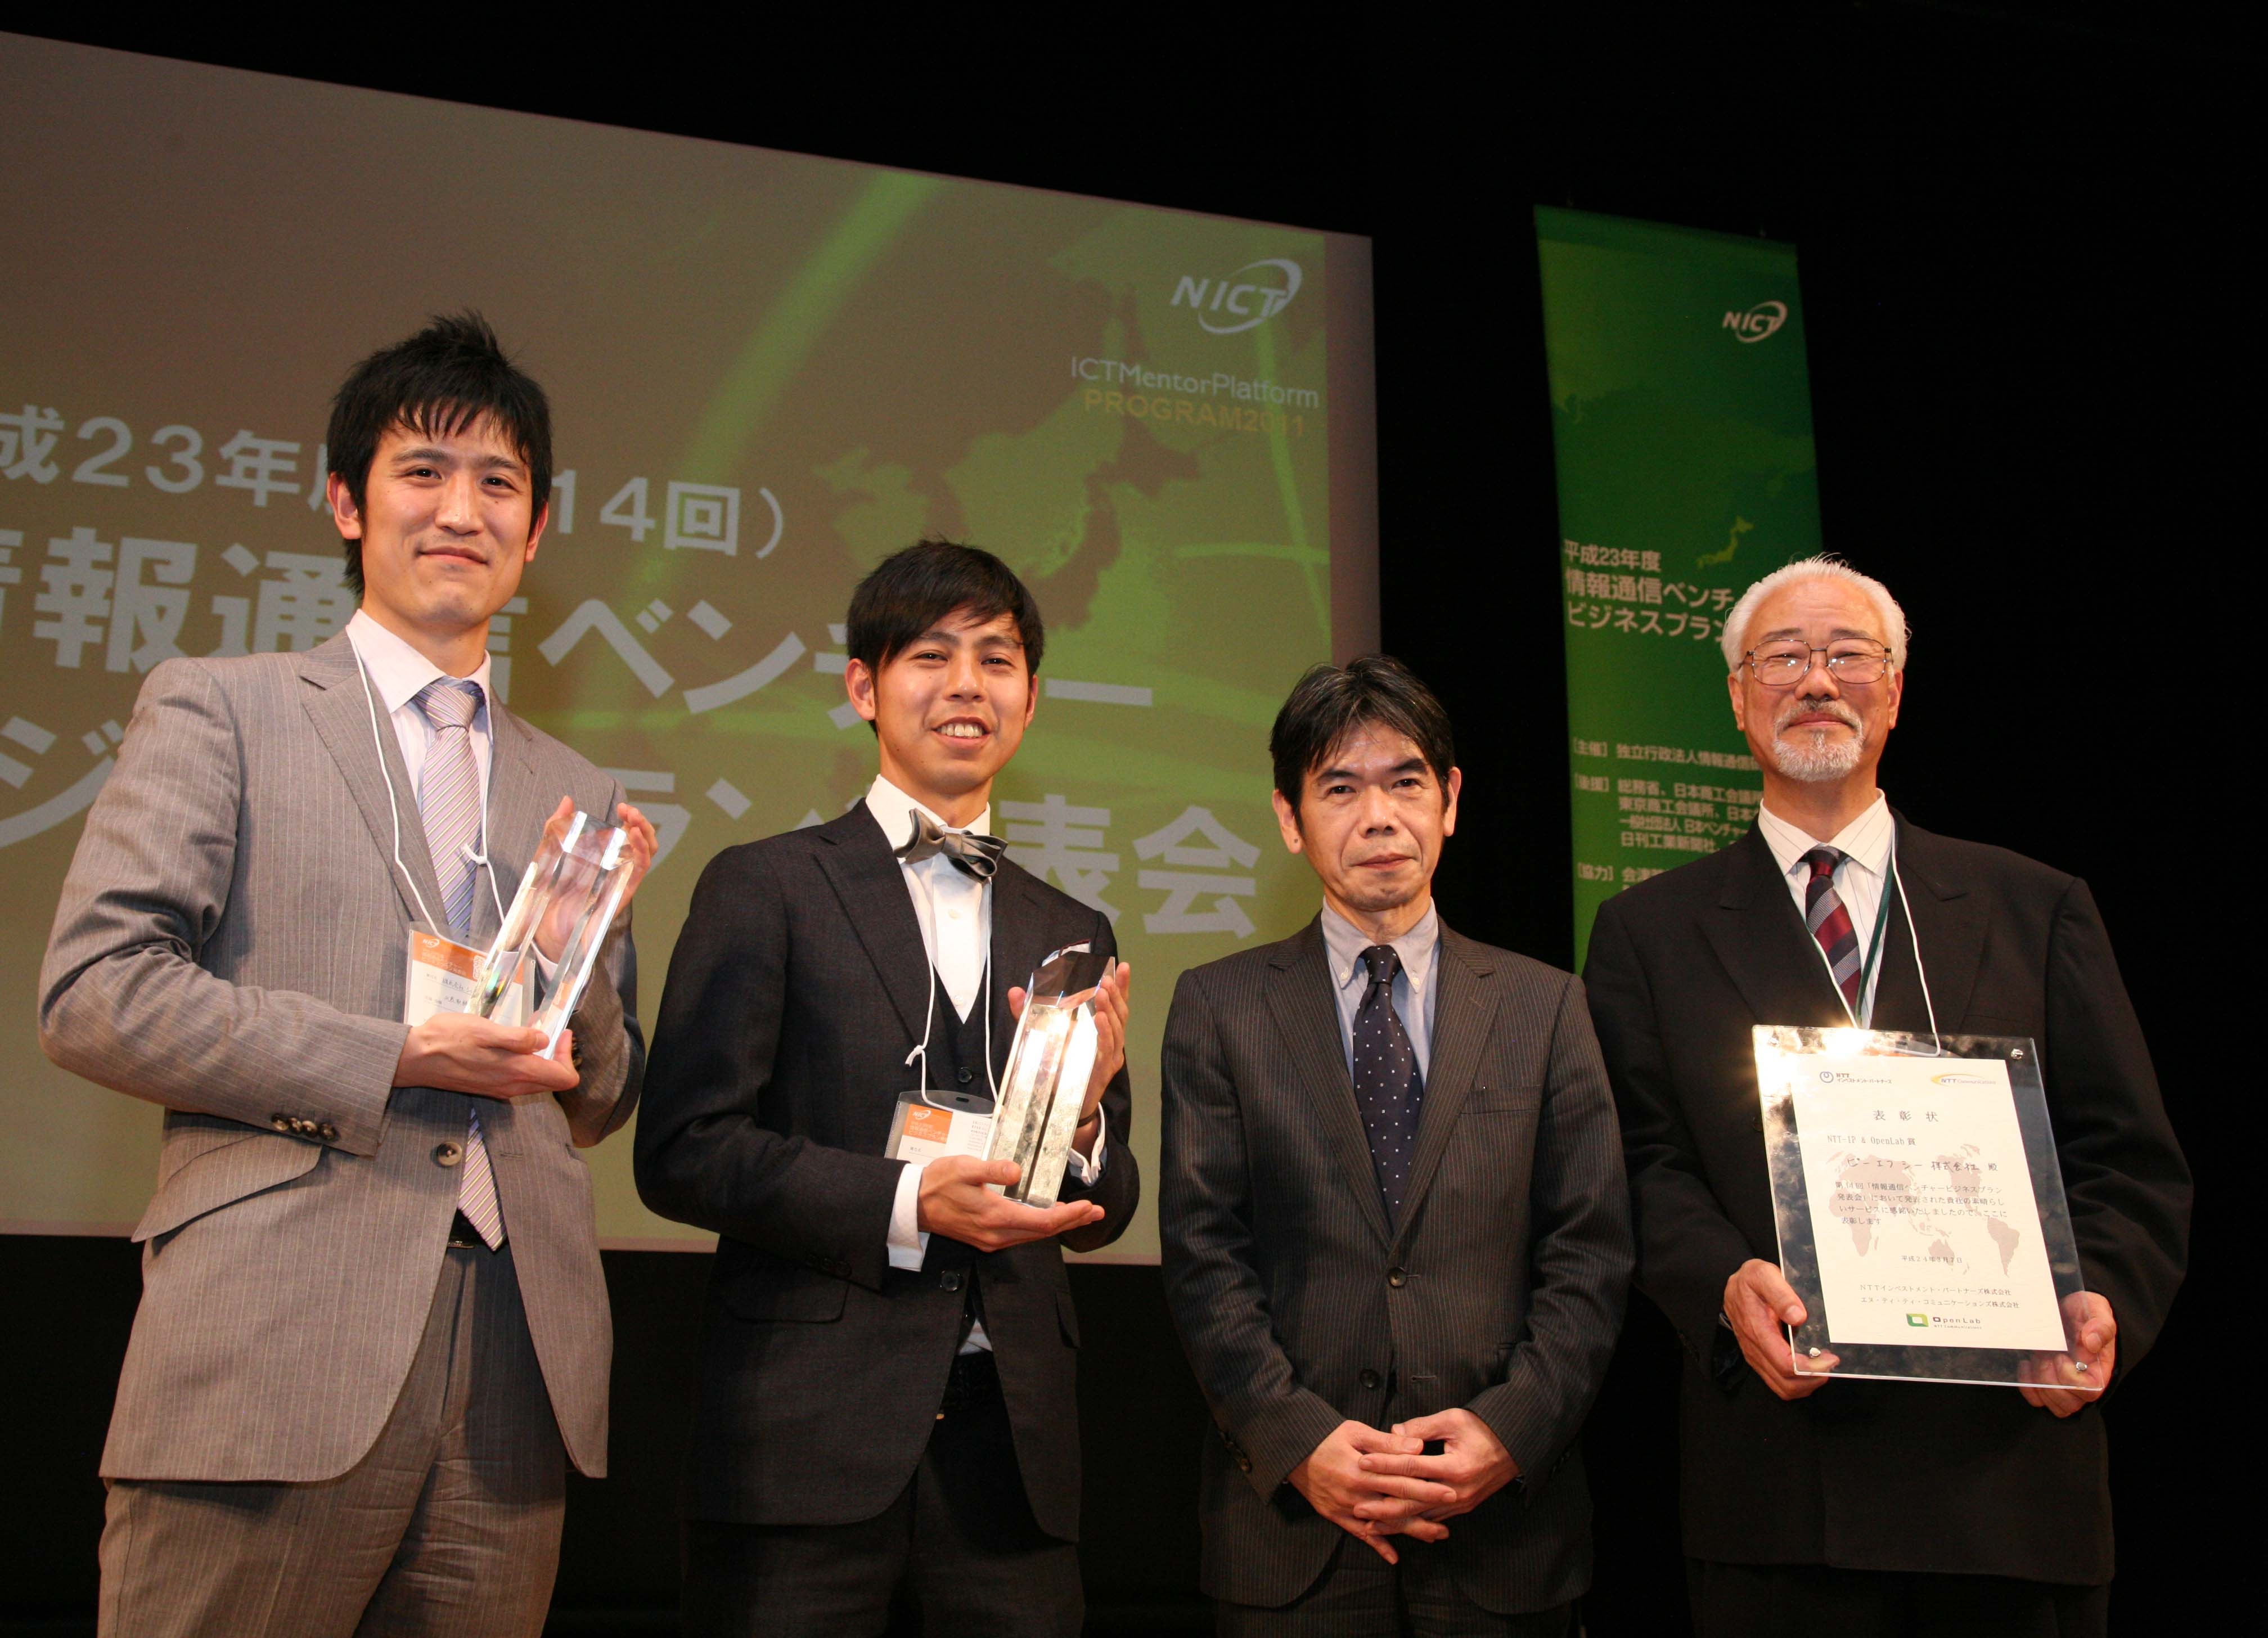 NICT情報通信ベンチャービジネスプラン発表会シェアウィズ特別賞受賞の画像